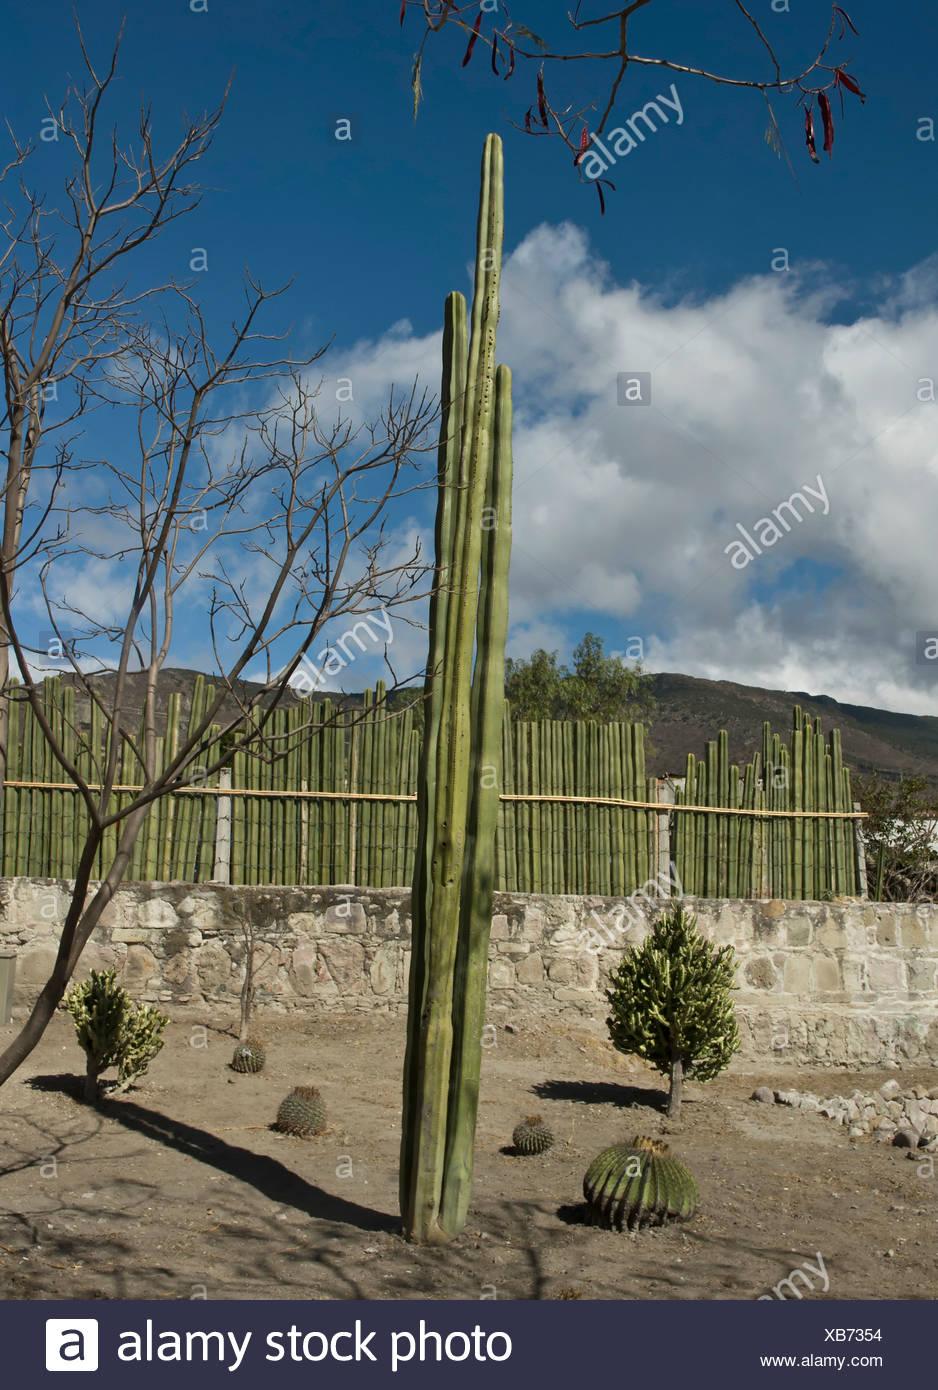 Pachycereus Marginatus, Cactus, Mexican fence post cactus. - Stock Image